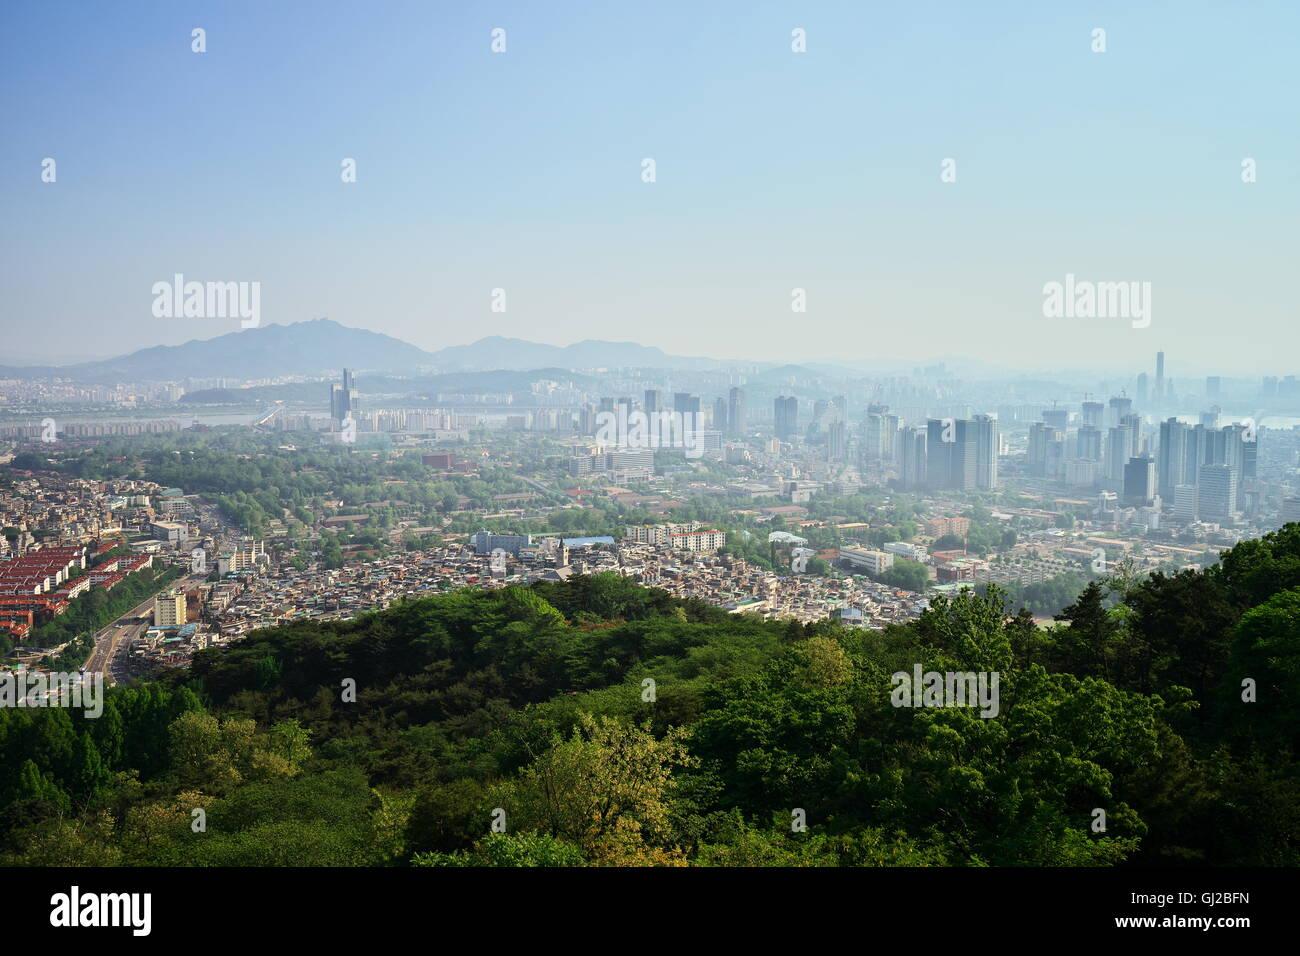 Seoul Photos  Seoul Images  Alamy